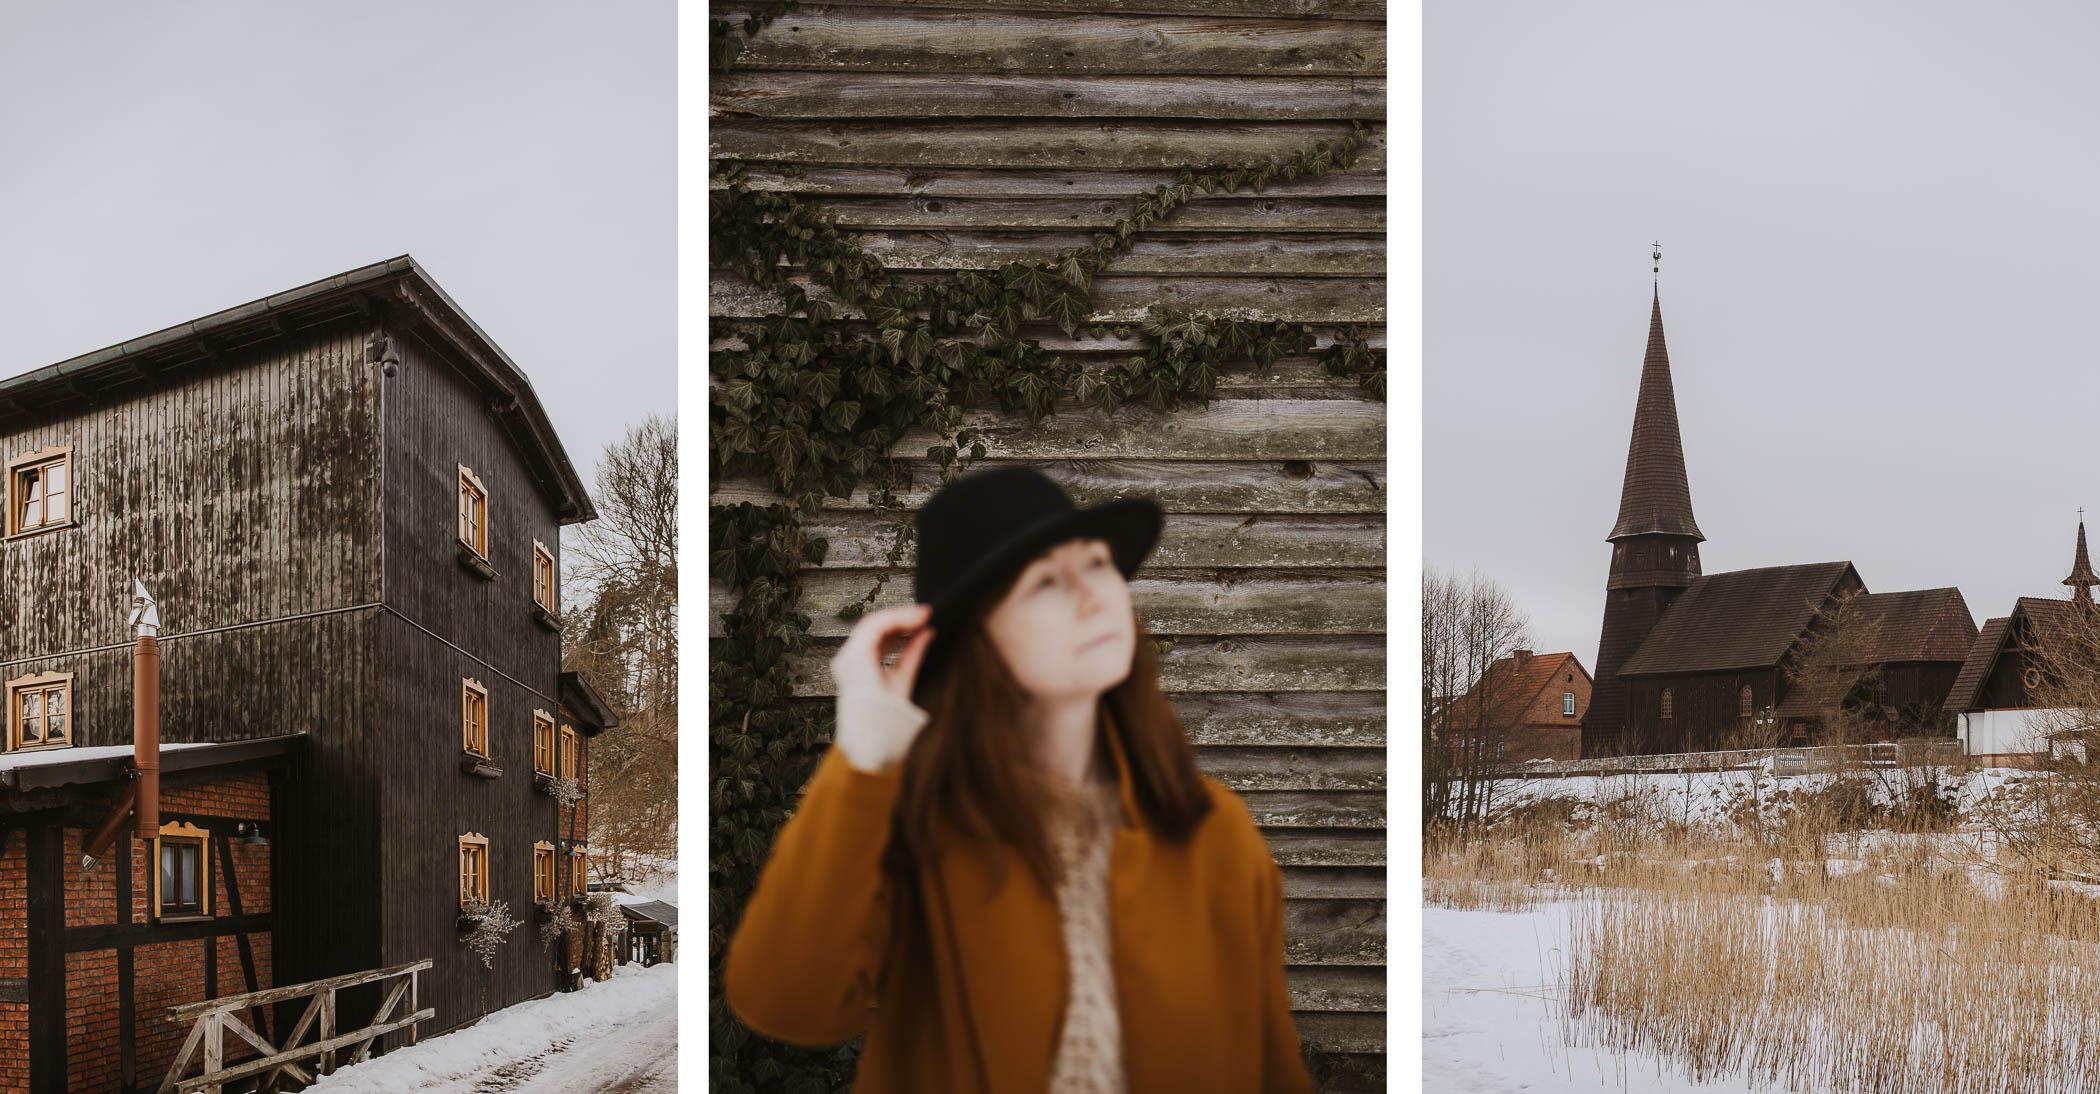 Wieś KASZUBSKA DYWAN